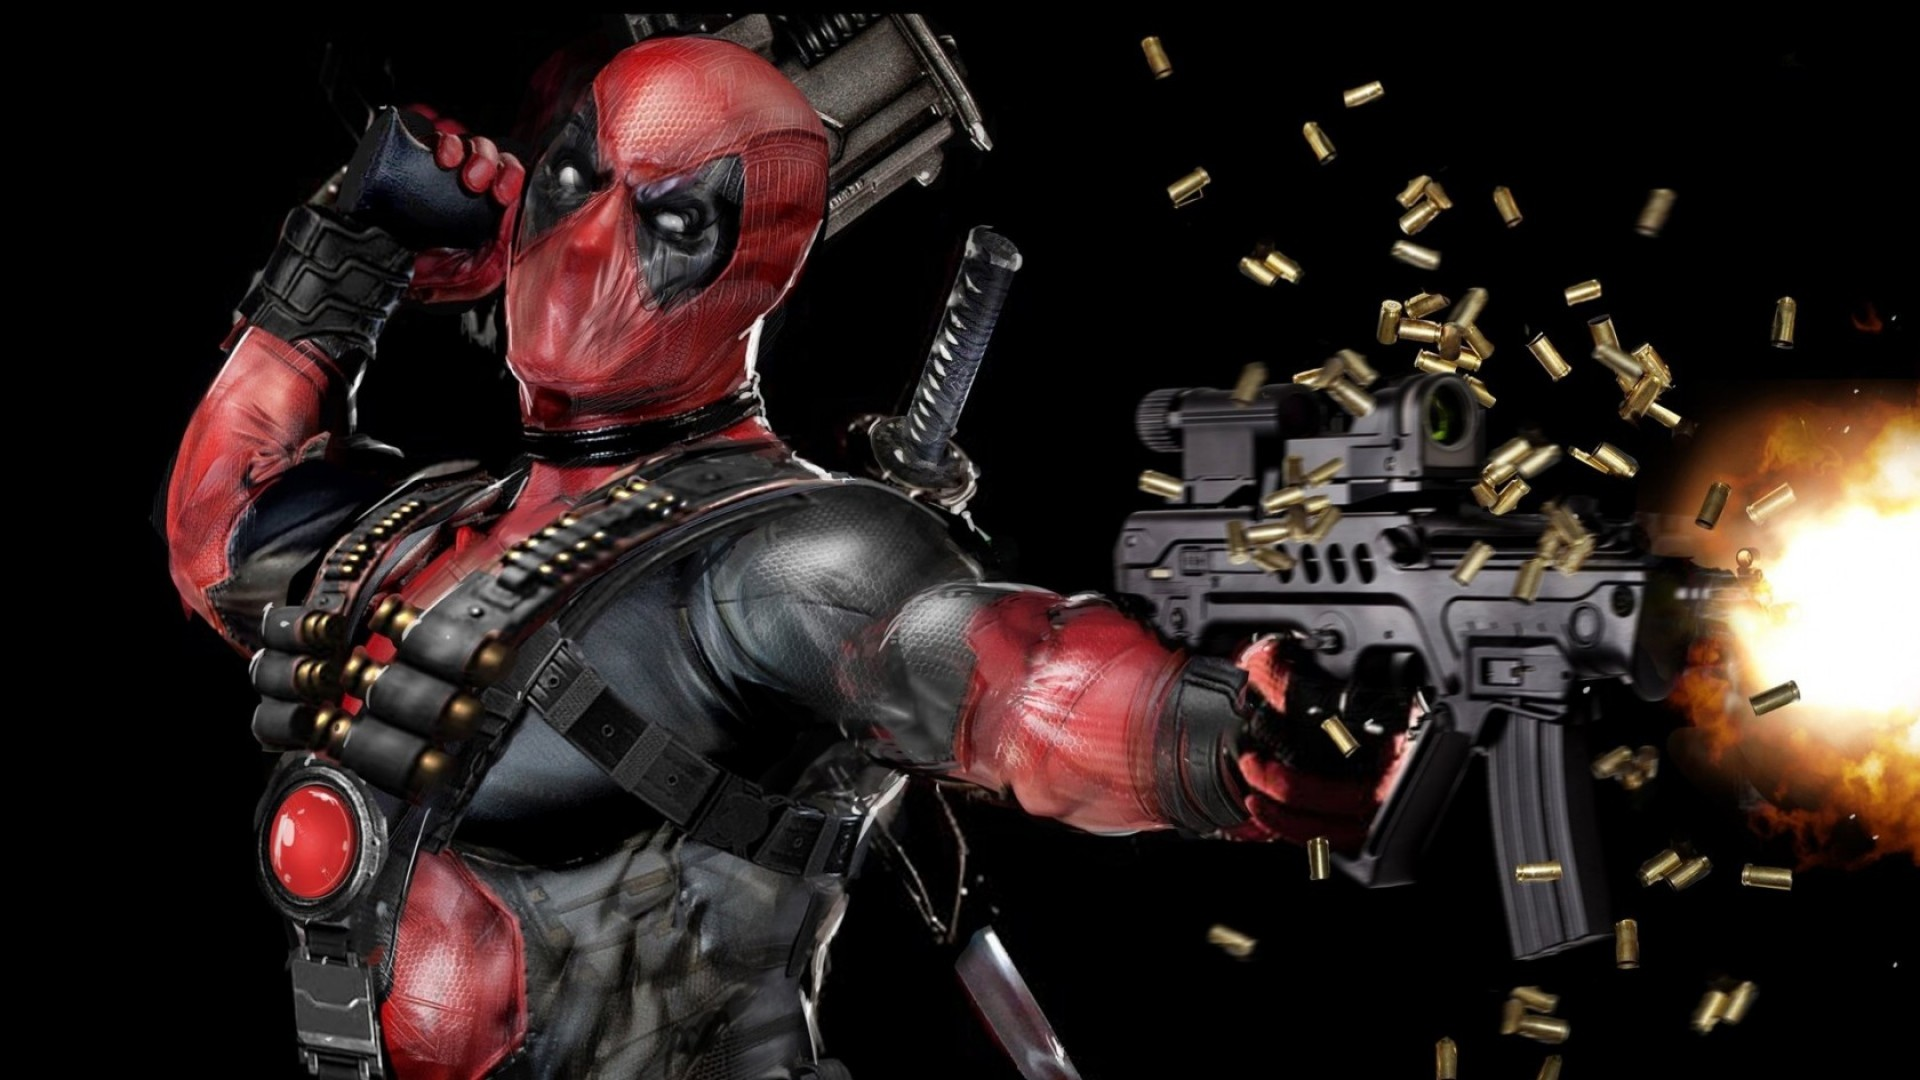 Deadpool HD Wallpapers Backgrounds Wallpaper | HD Wallpapers | Pinterest | Deadpool  wallpaper, Deadpool and Wallpaper